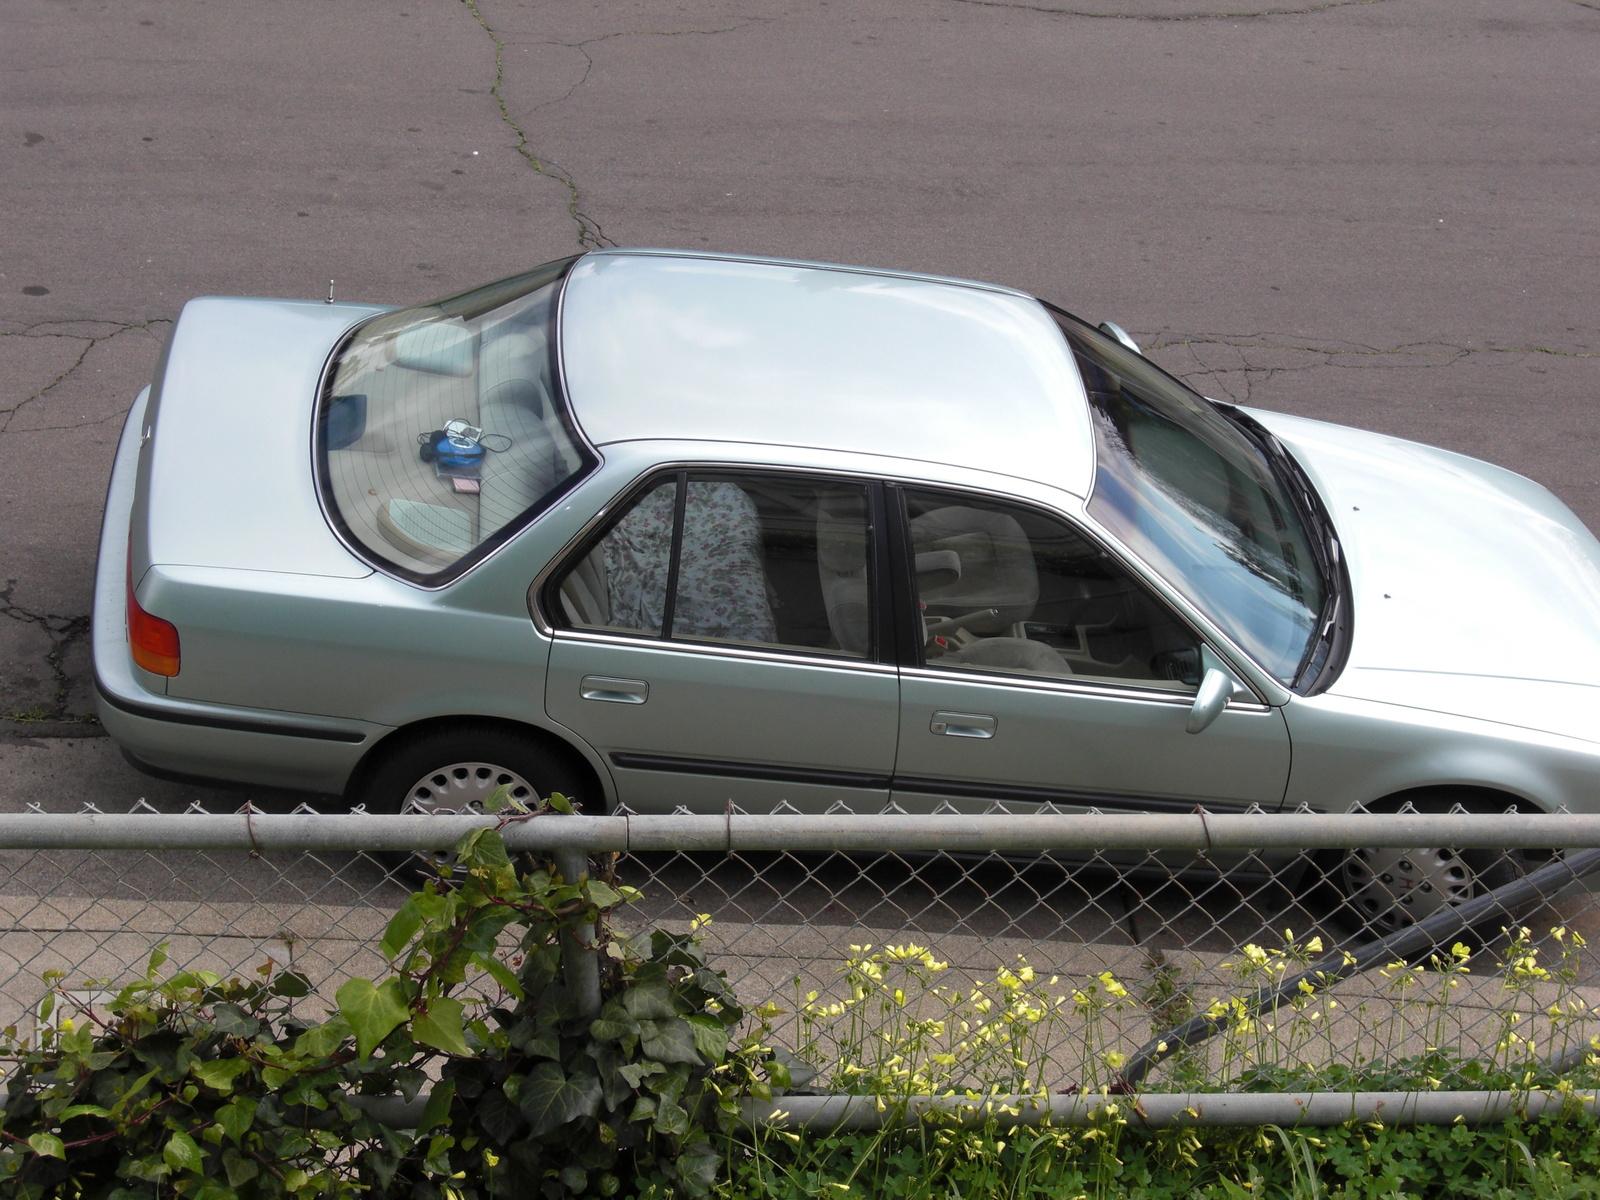 2009 Honda Accord Fuse Box Diagram In Addition 1992 Honda Accord Fuse